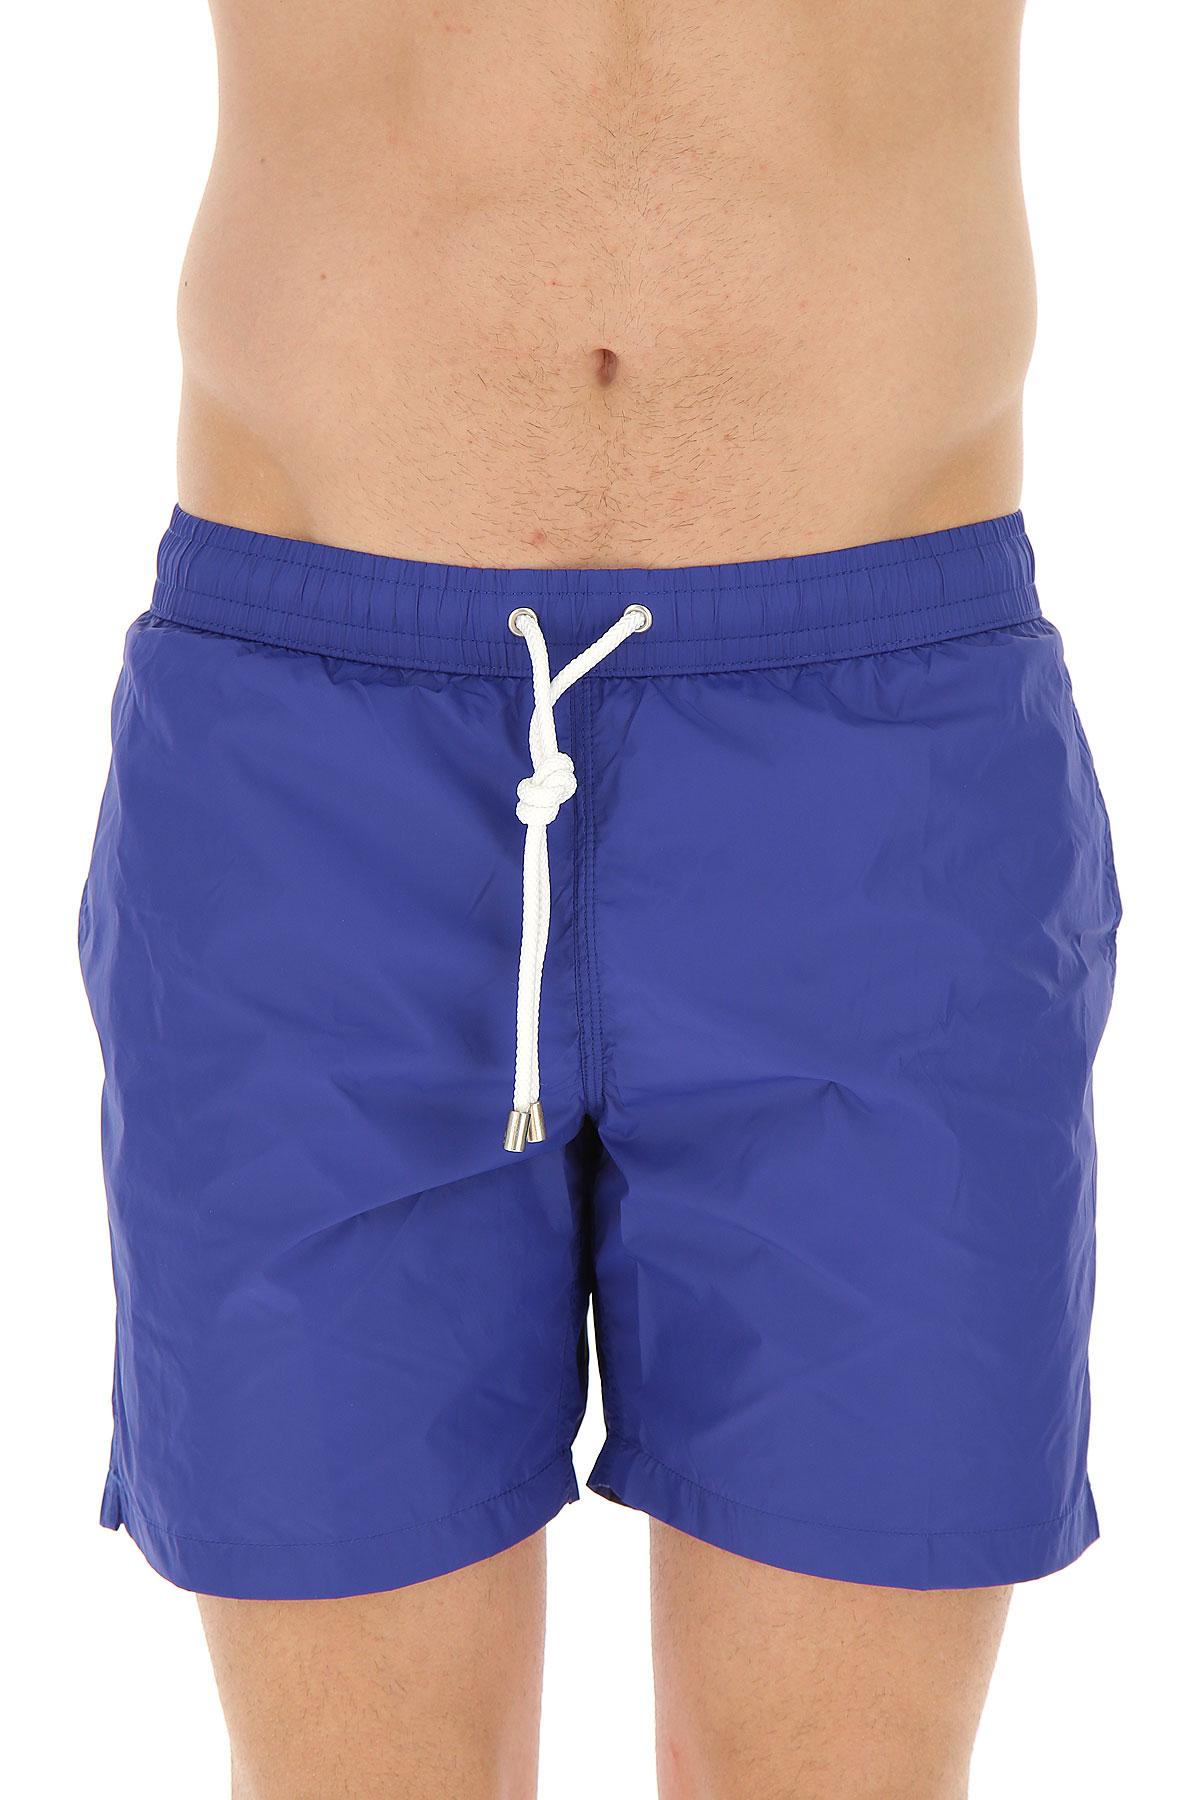 Image of Hartford Swim Shorts Trunks for Men On Sale, Night Blue, polyamide, 2017, M XXL